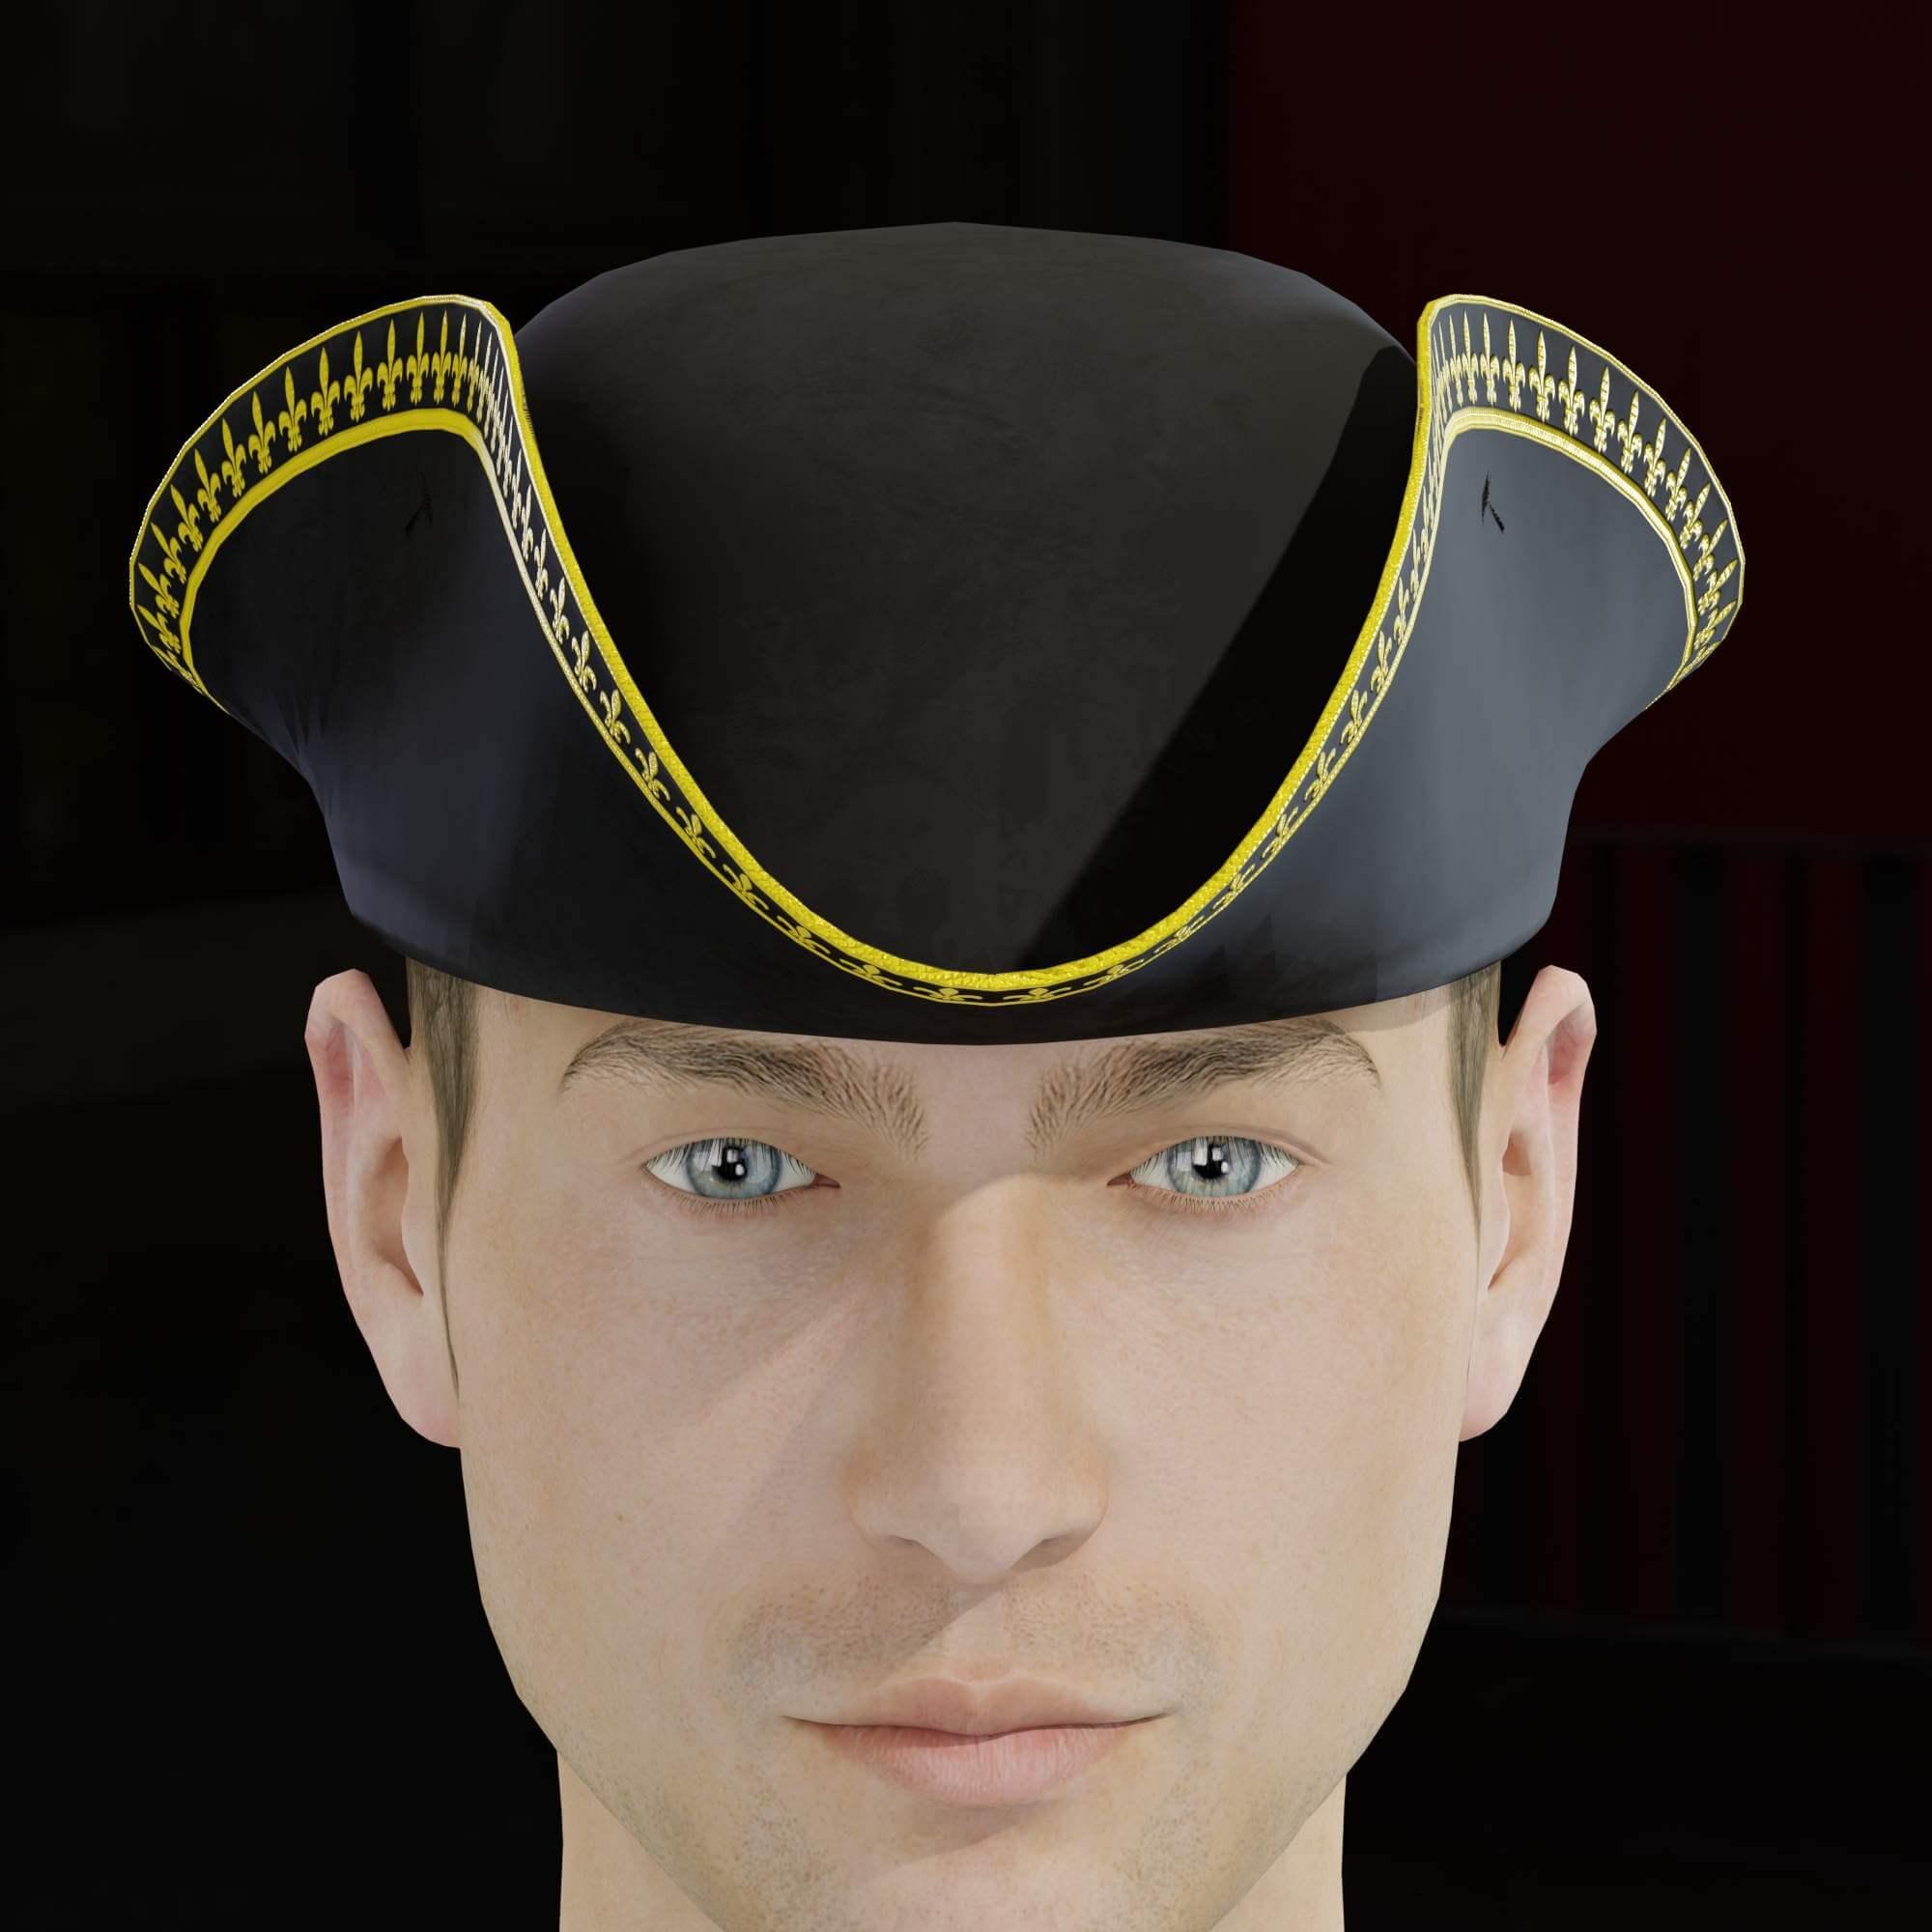 I love big cocks cap by custom